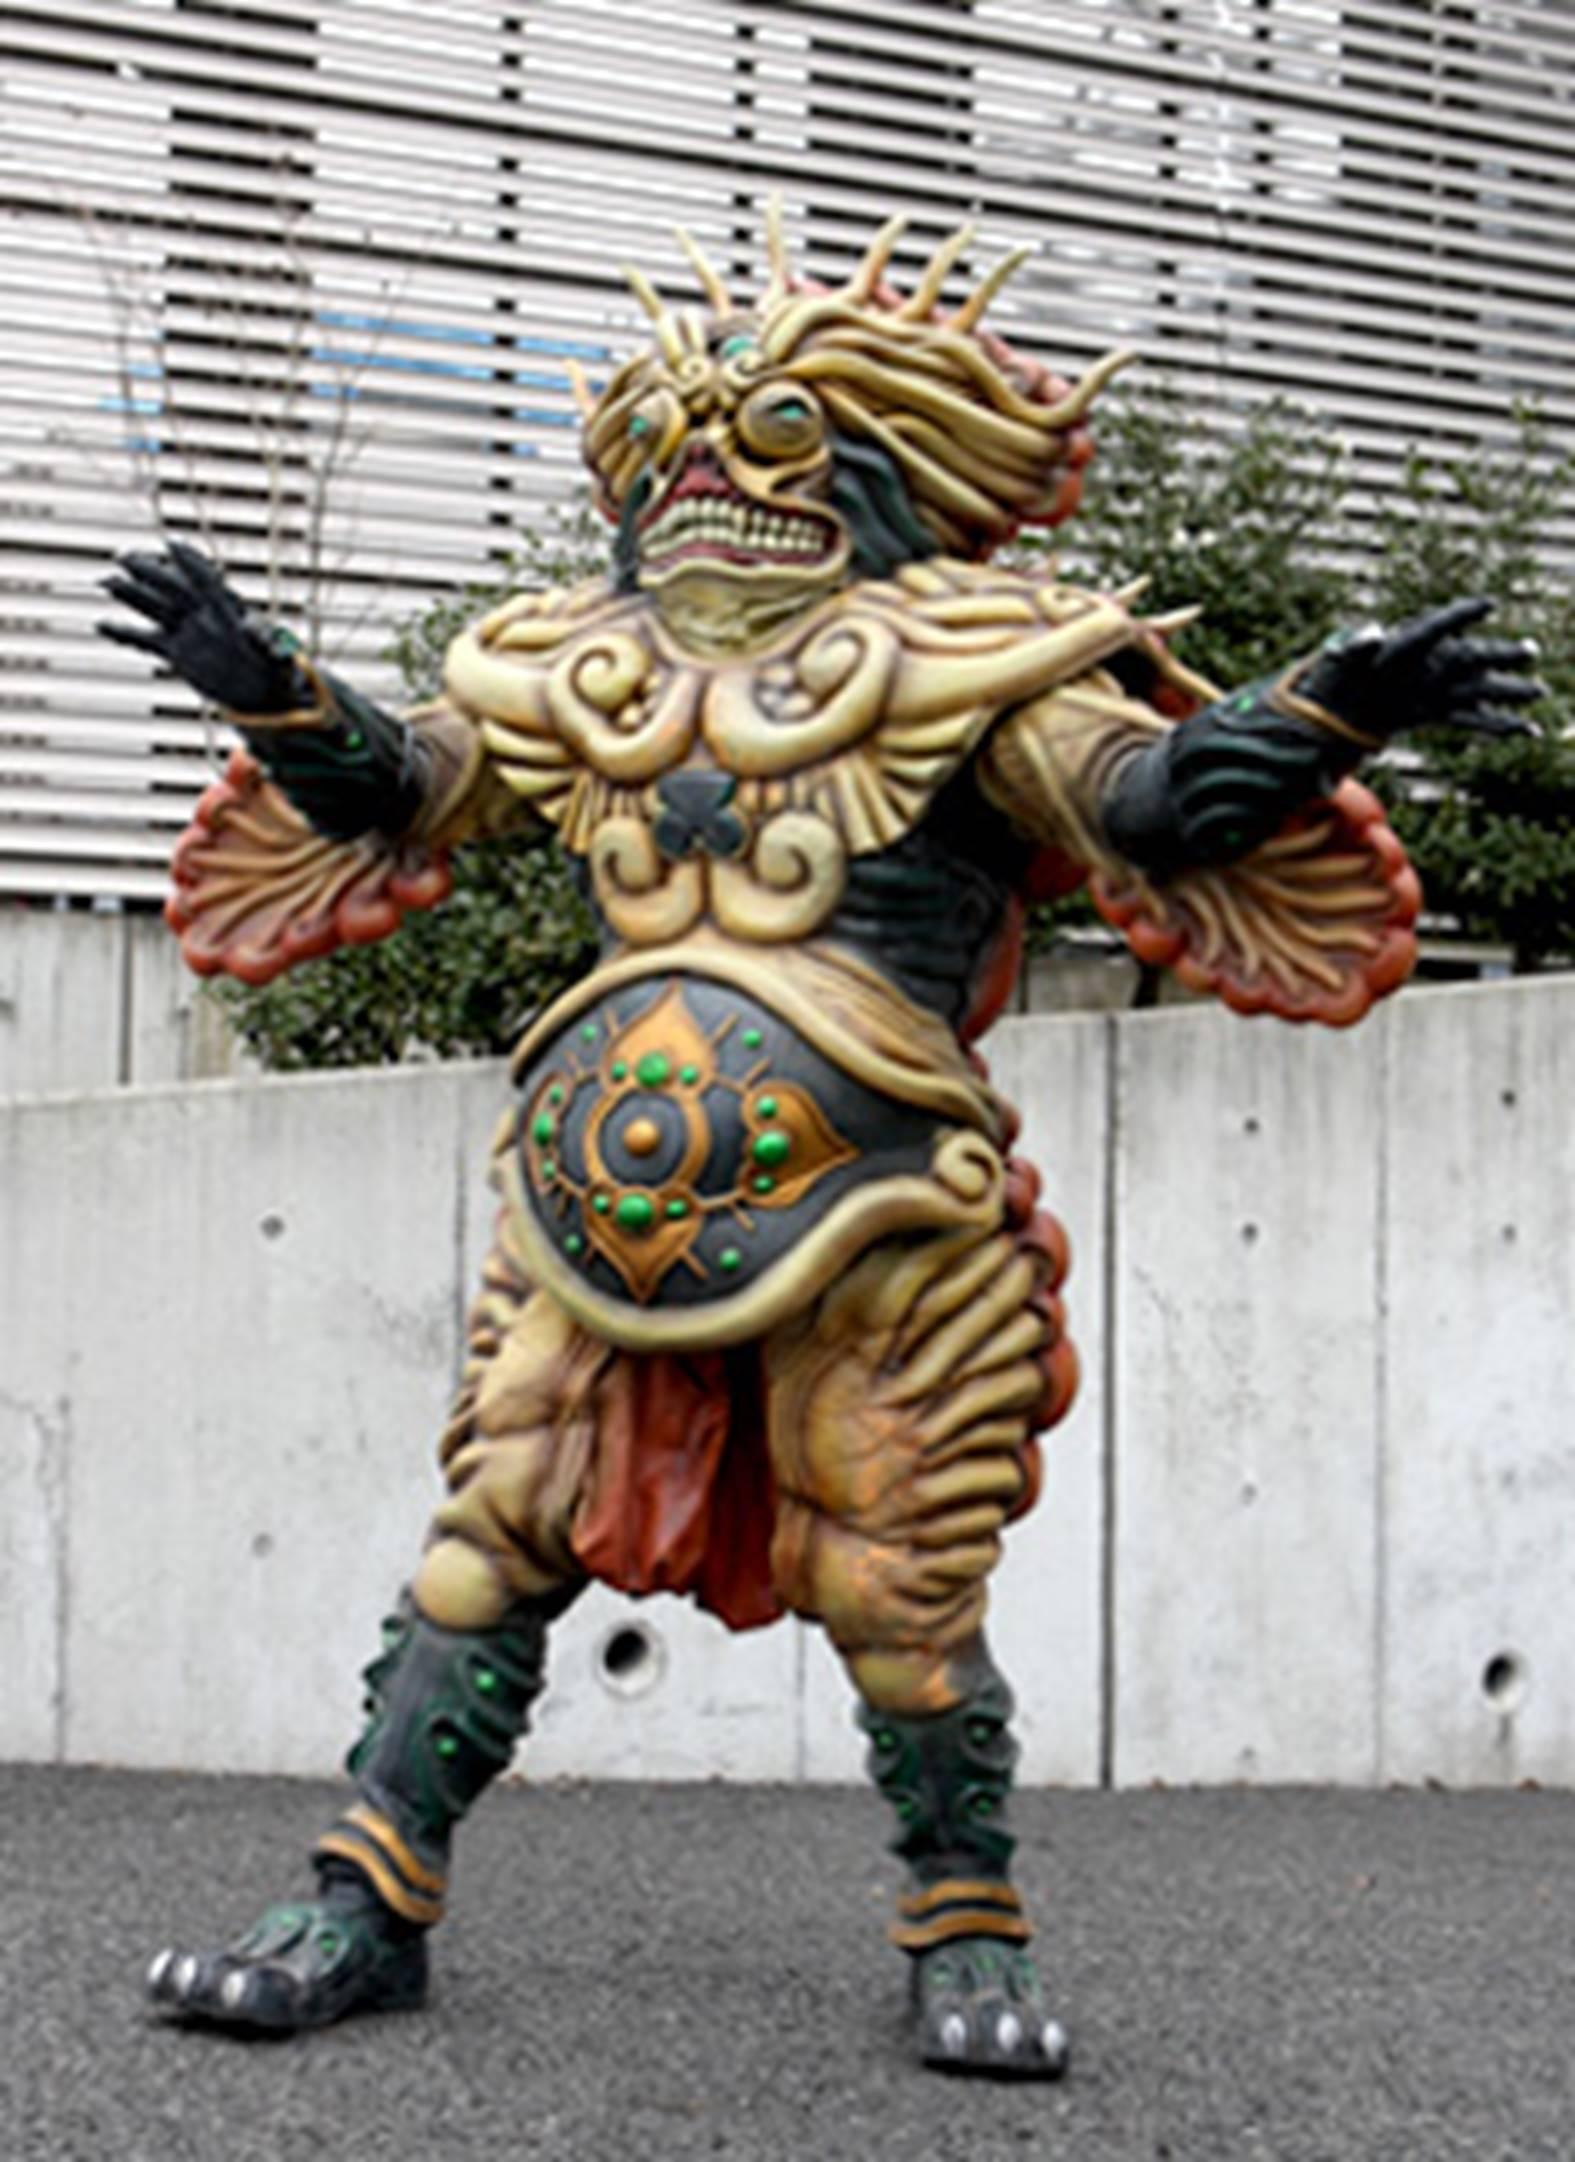 File:Zuboshimeshi.jpg